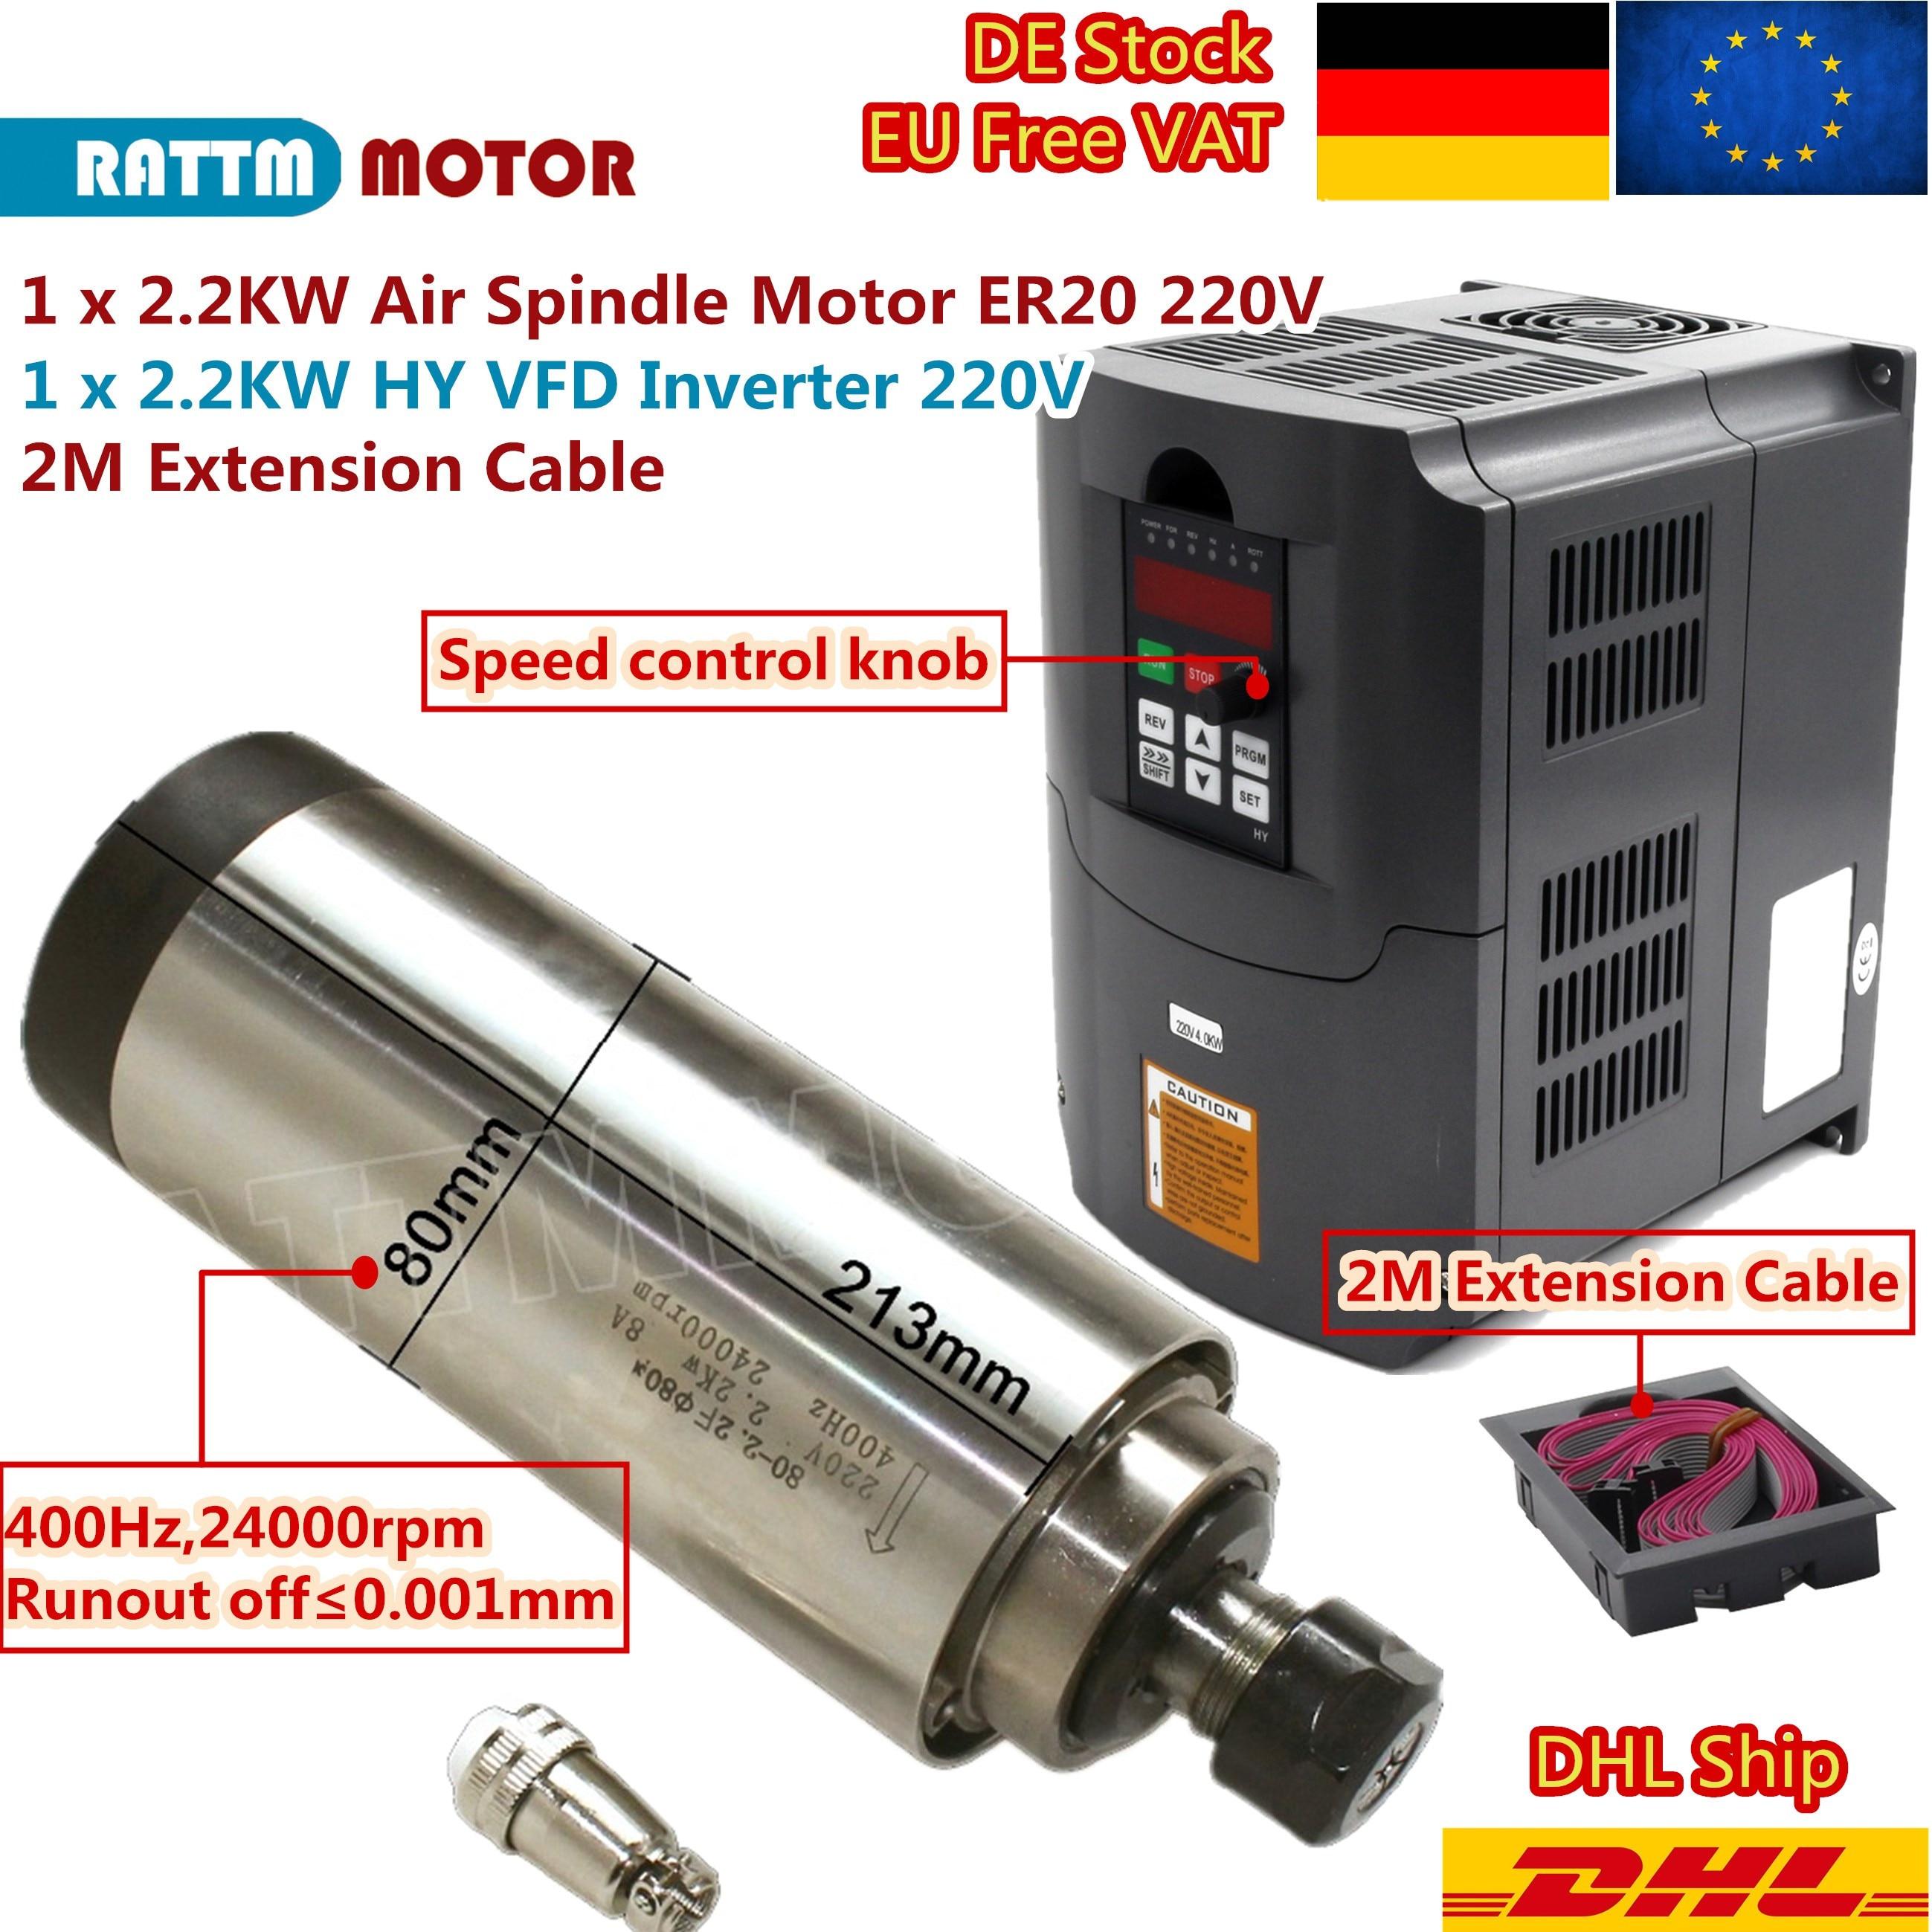 〖EU-محرك المغزل المبرد بالهواء ، 220 كيلو واط ، 24000 فولت ، 8 أمبير ، 0.01 دورة في الدقيقة ، ER20 ، مللي متر ، محمل سيراميك ، عاكس 2.2kw ، VFD ، شحن مجاني